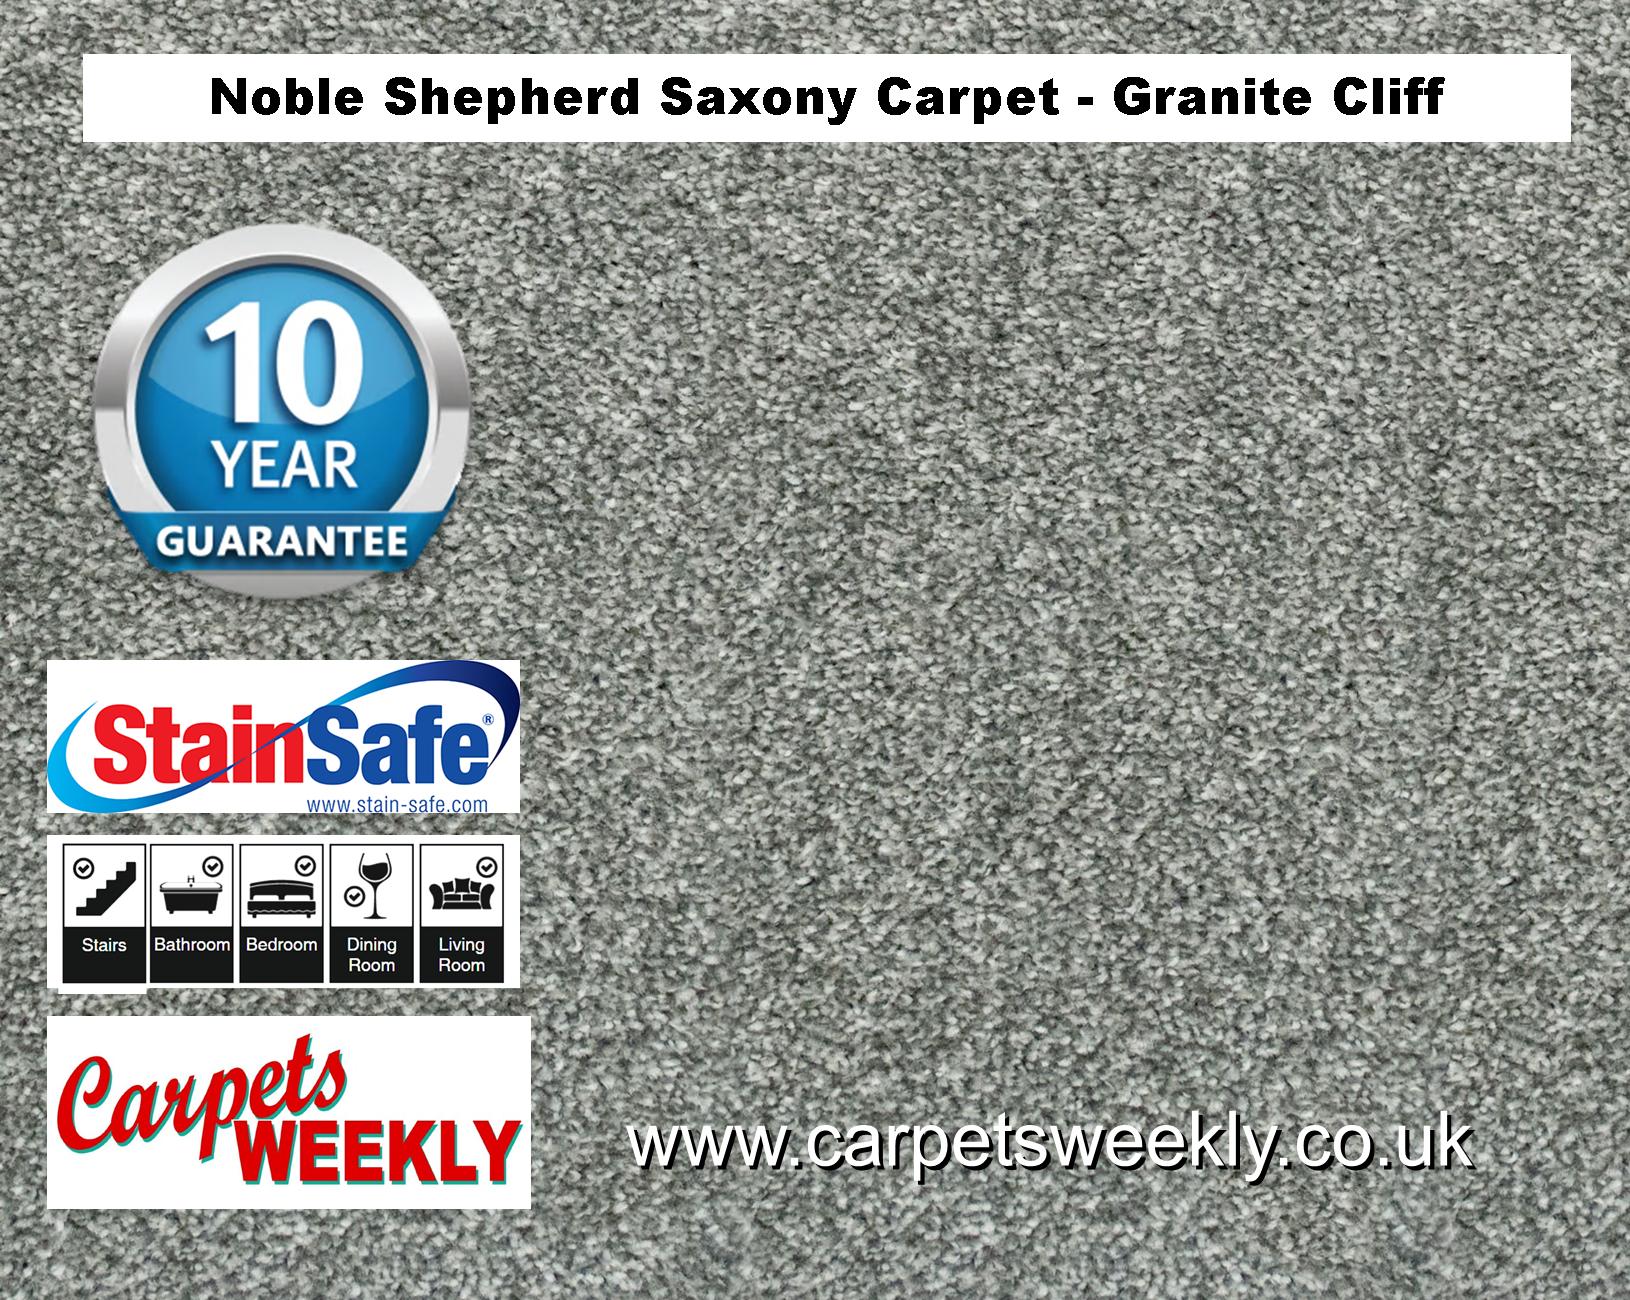 Noble Shepherd Saxony Carpet from Carpets Weekly Granite Cliff Carpet